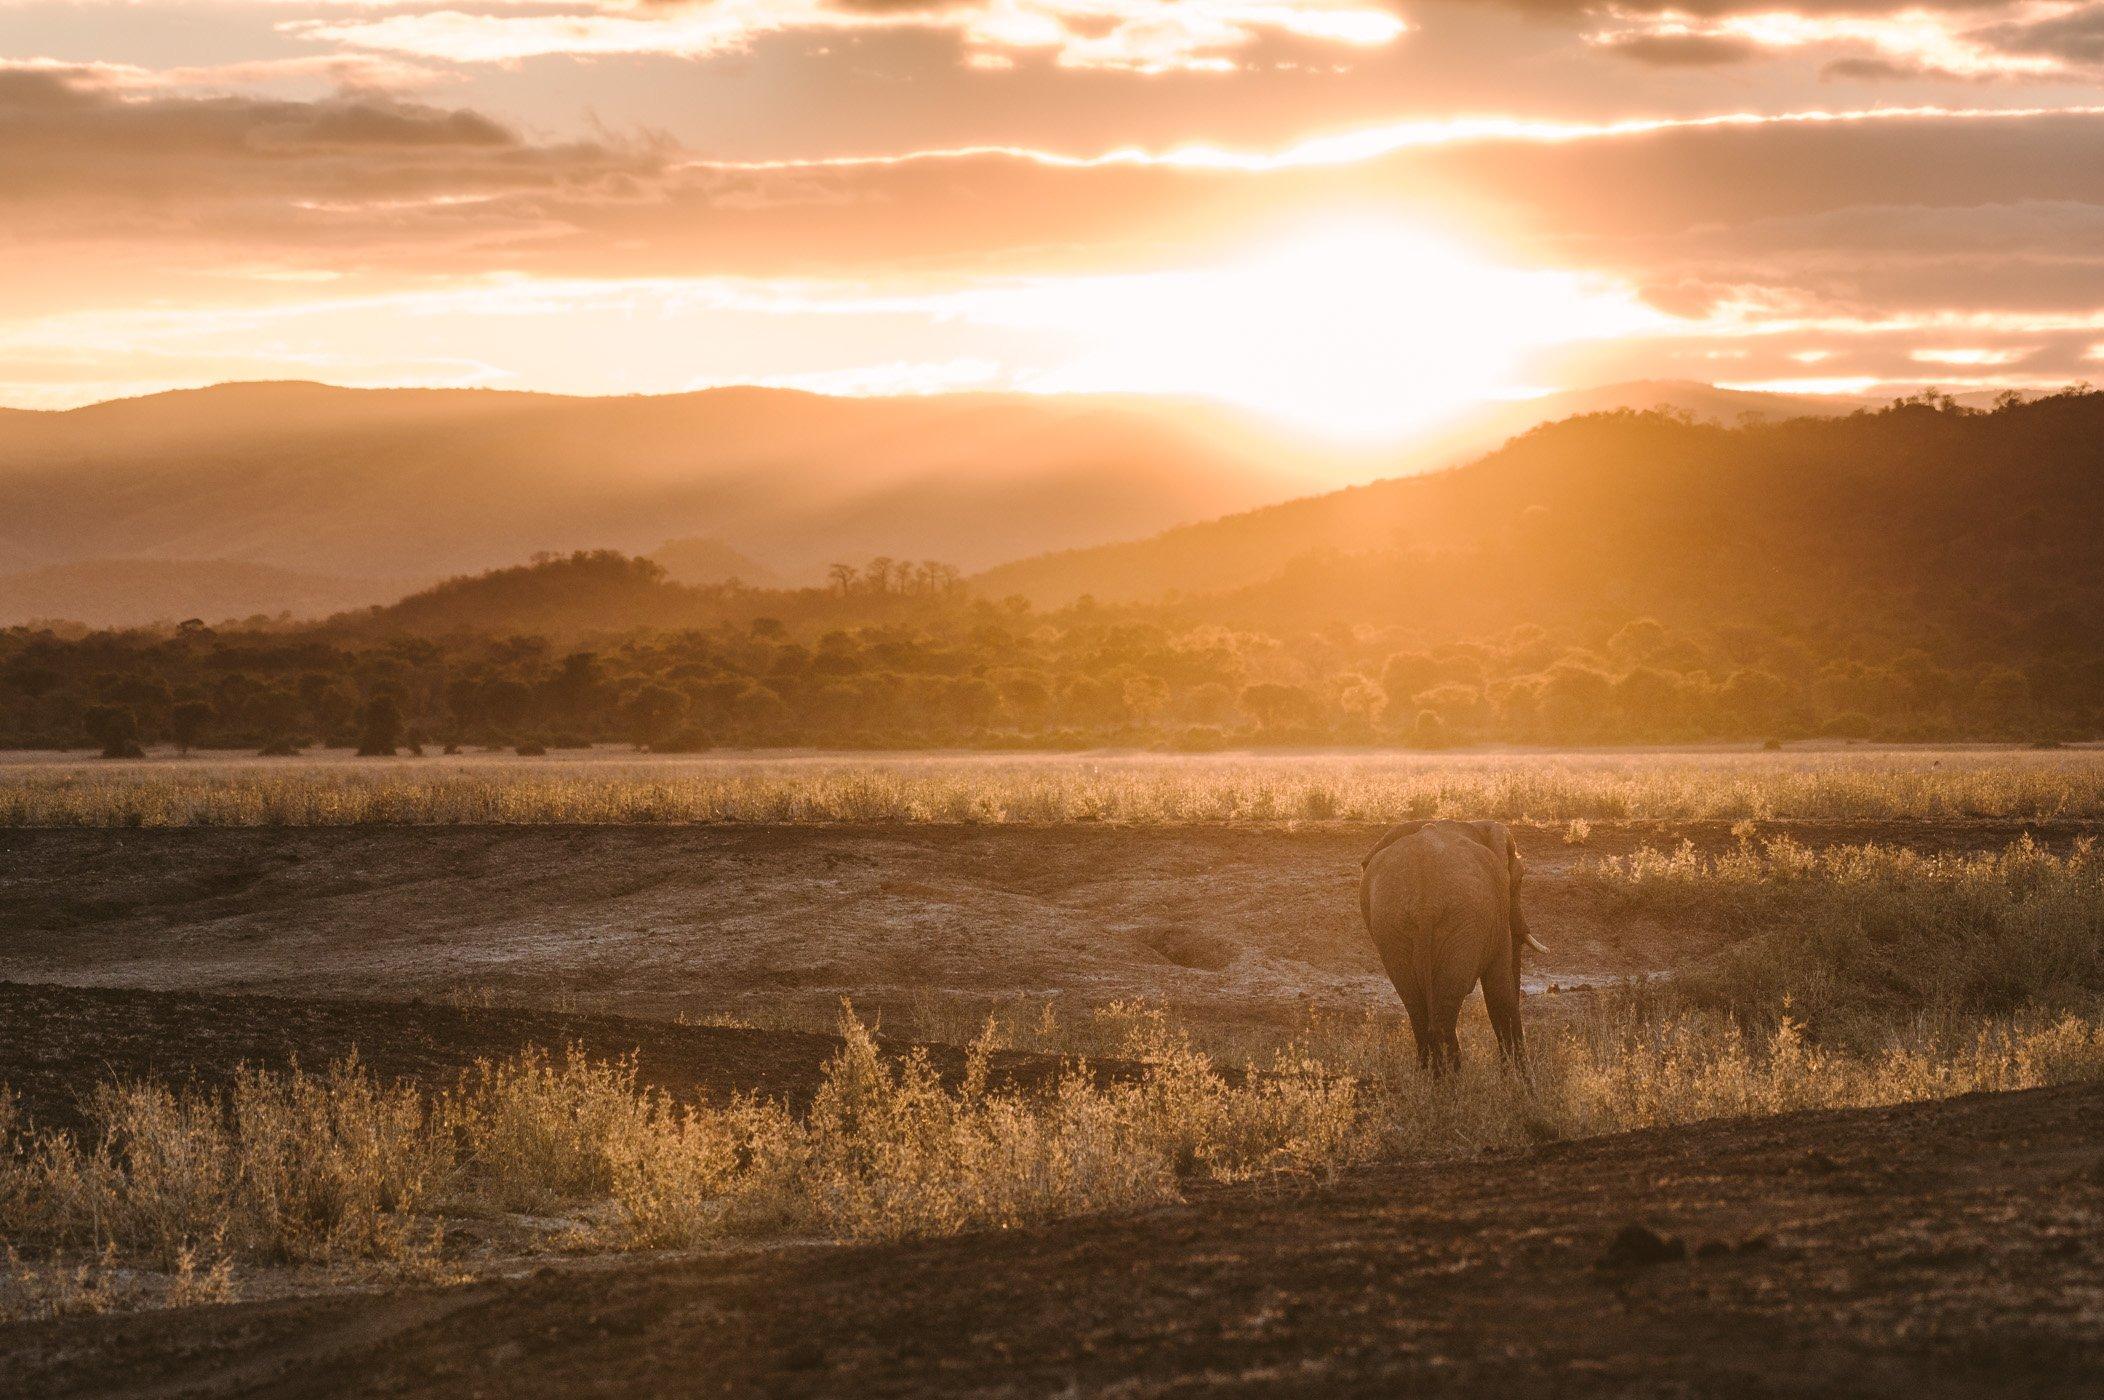 Elephant walks into the sunset in the Lower Zambezi National Park in Zambia